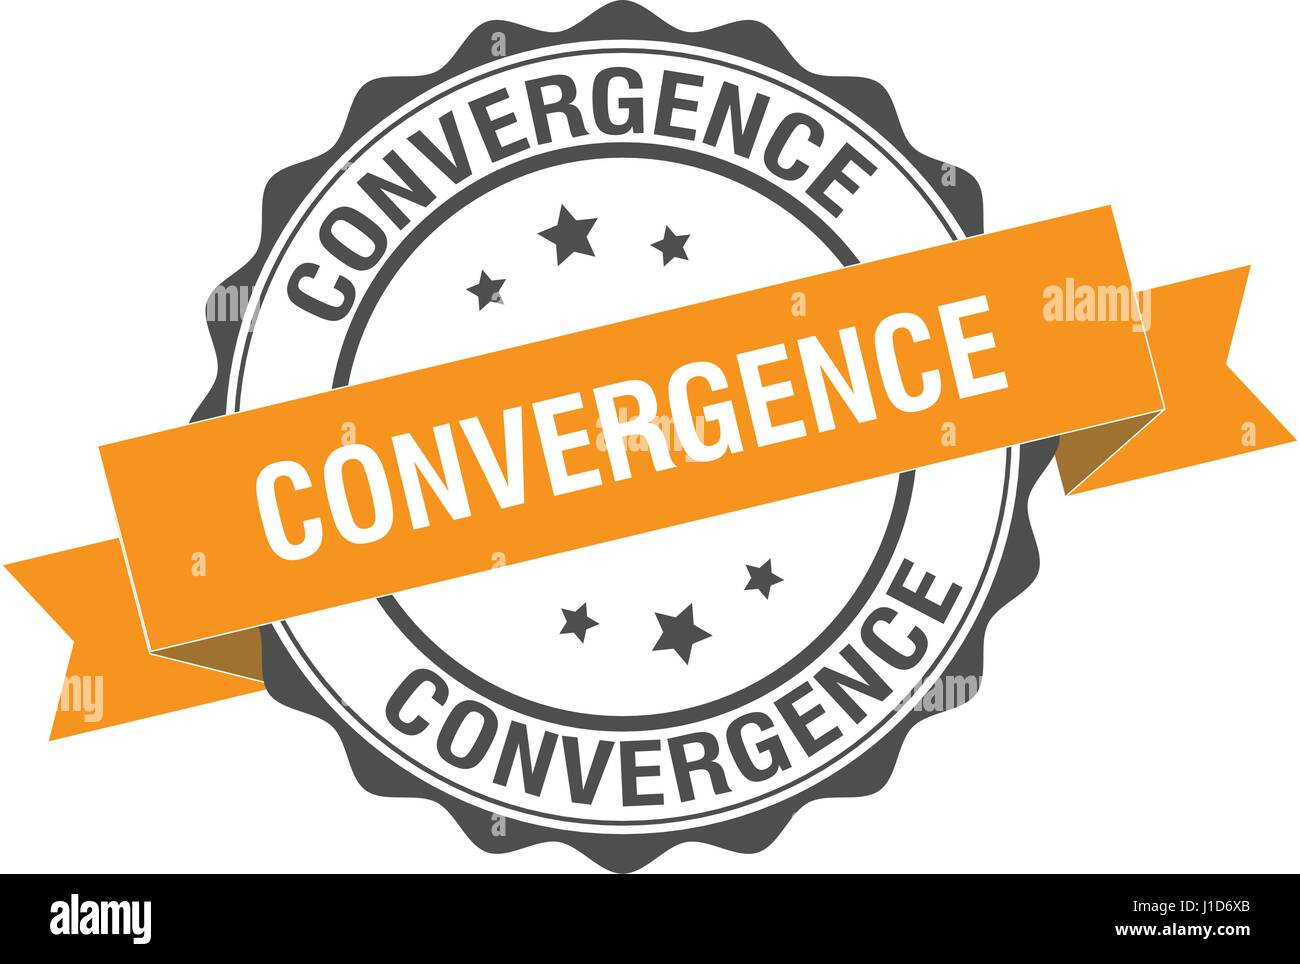 Konvergenz-Stempel-Abbildung Stockbild